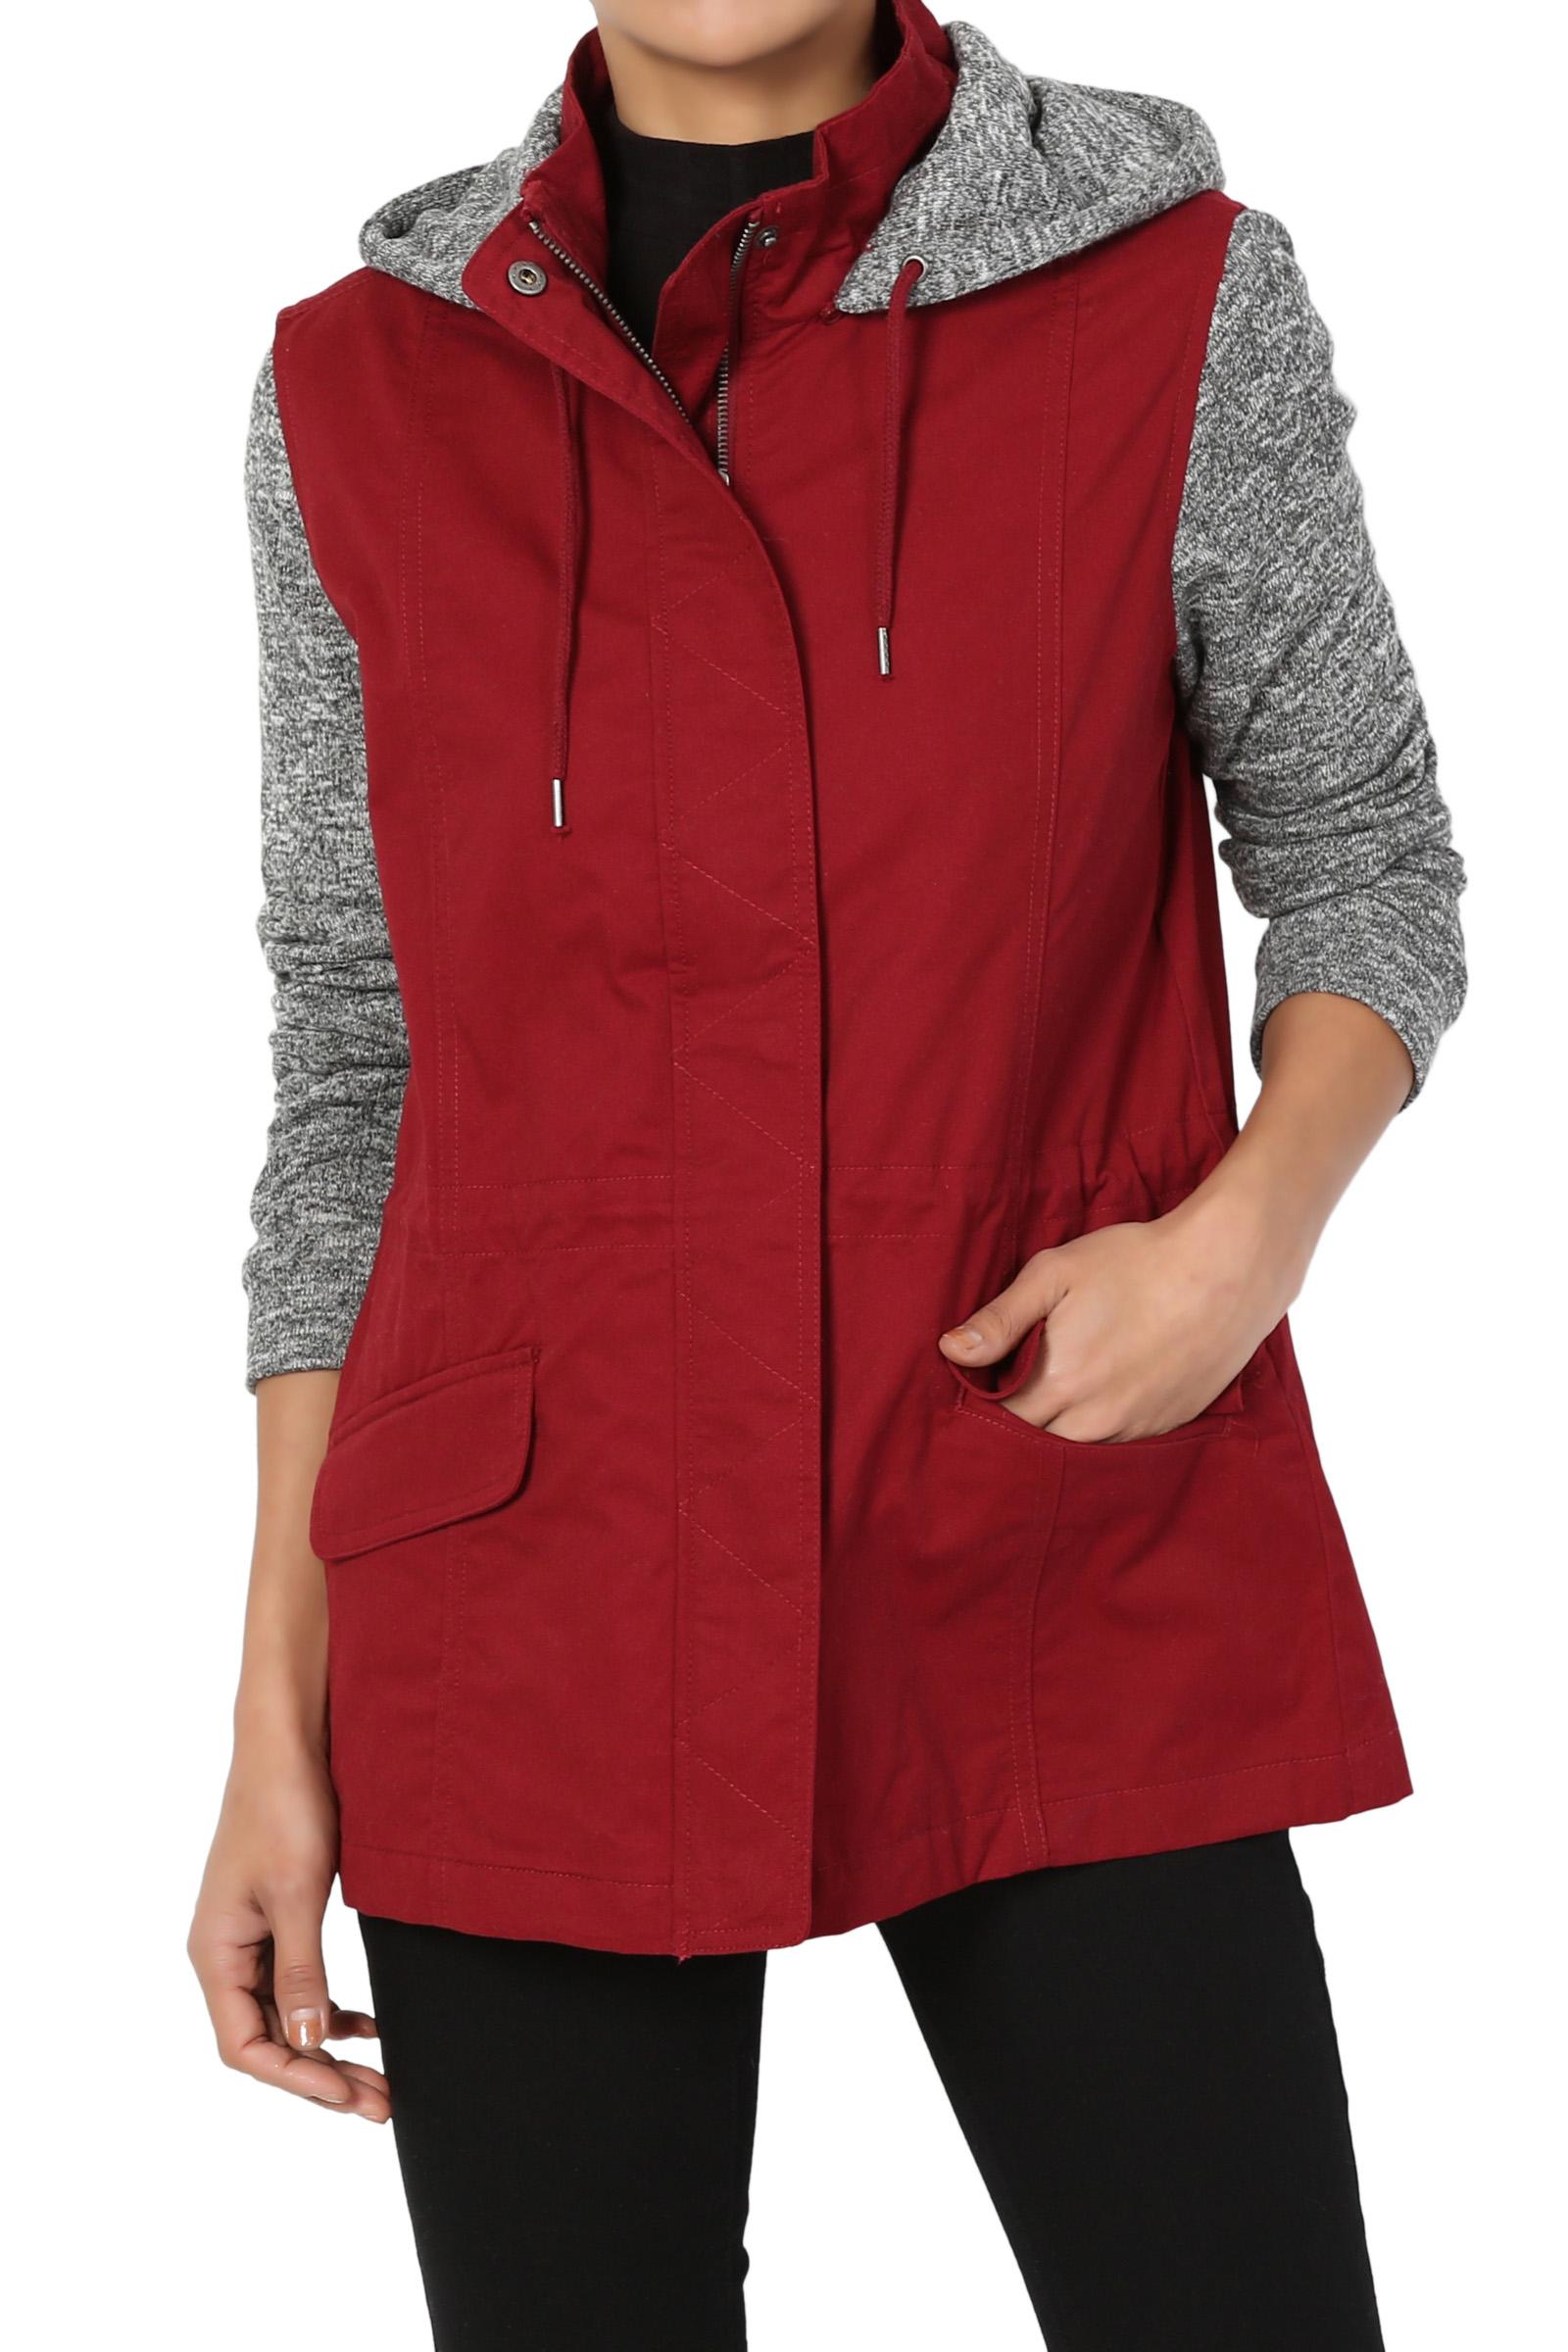 TheMogan Junior's Casual Grey Sweater Knit Sleeve & Hooded Utility Anorak Jacket